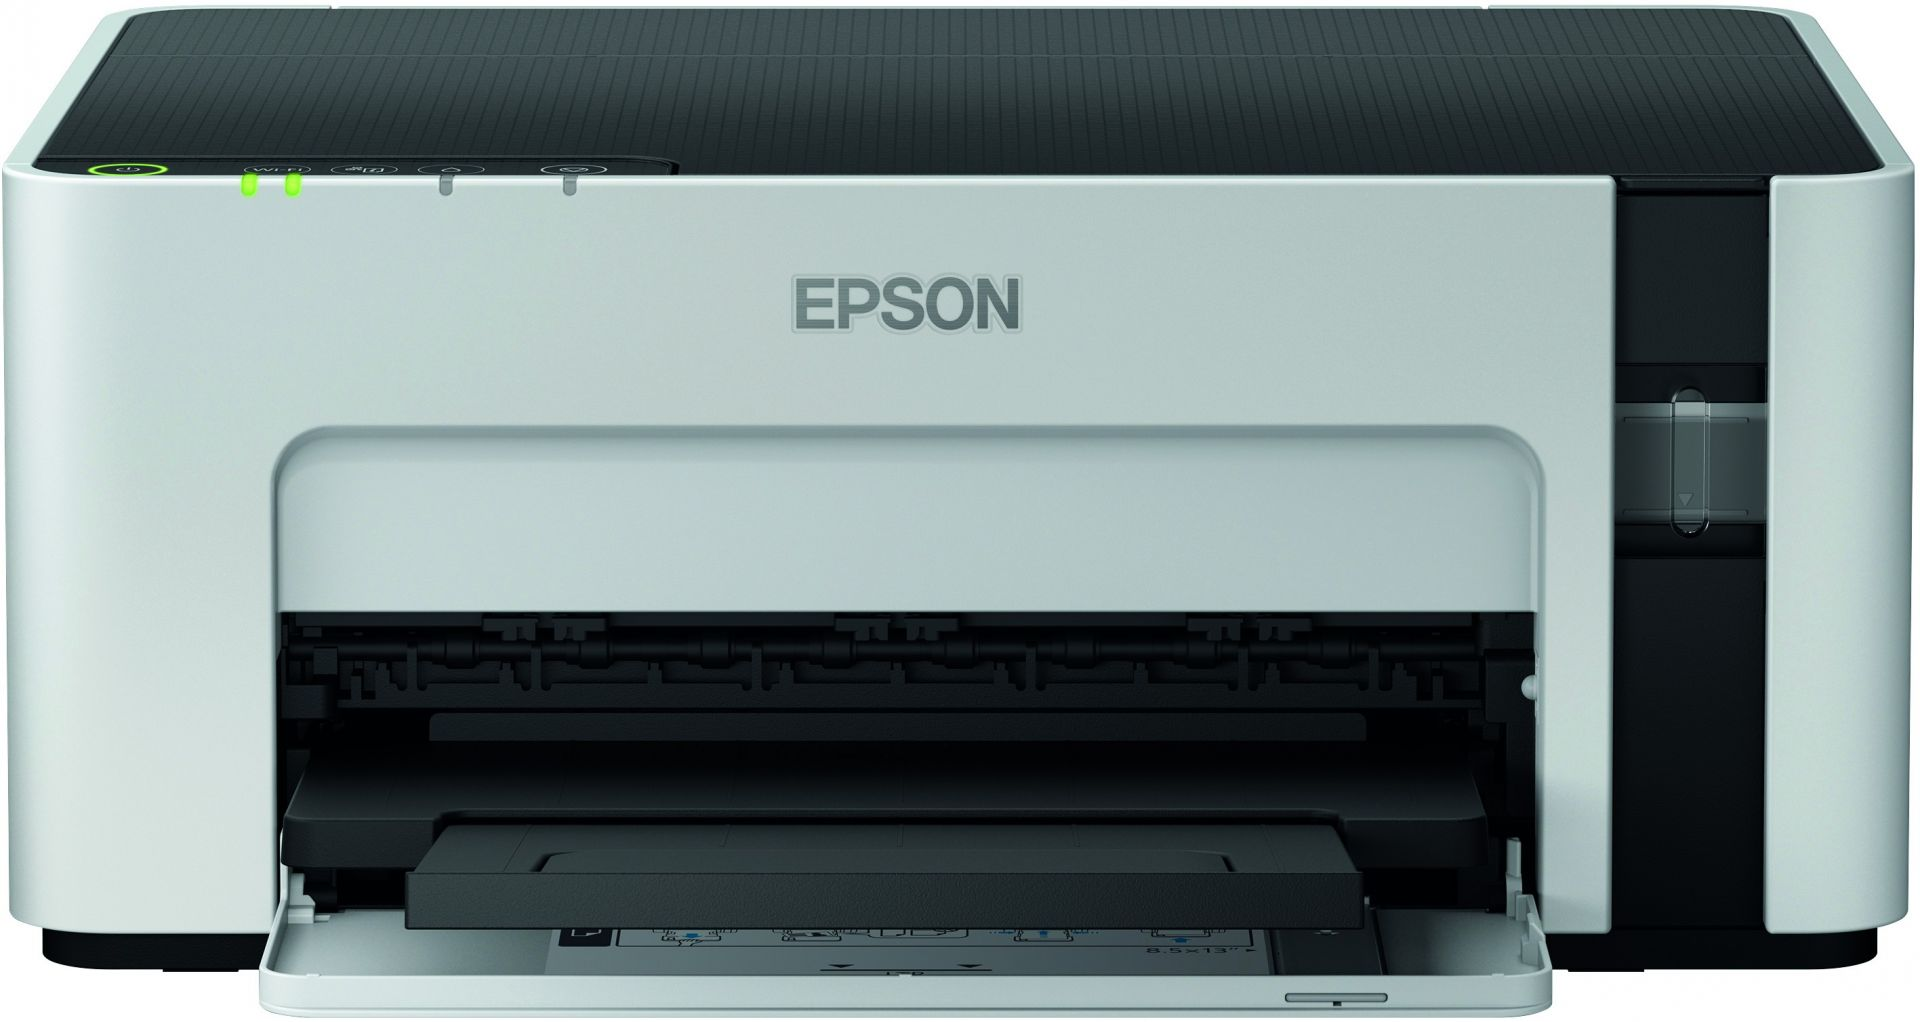 Nyomtató Epson EcoTank M1120 wireless tintasugaras nyomtató